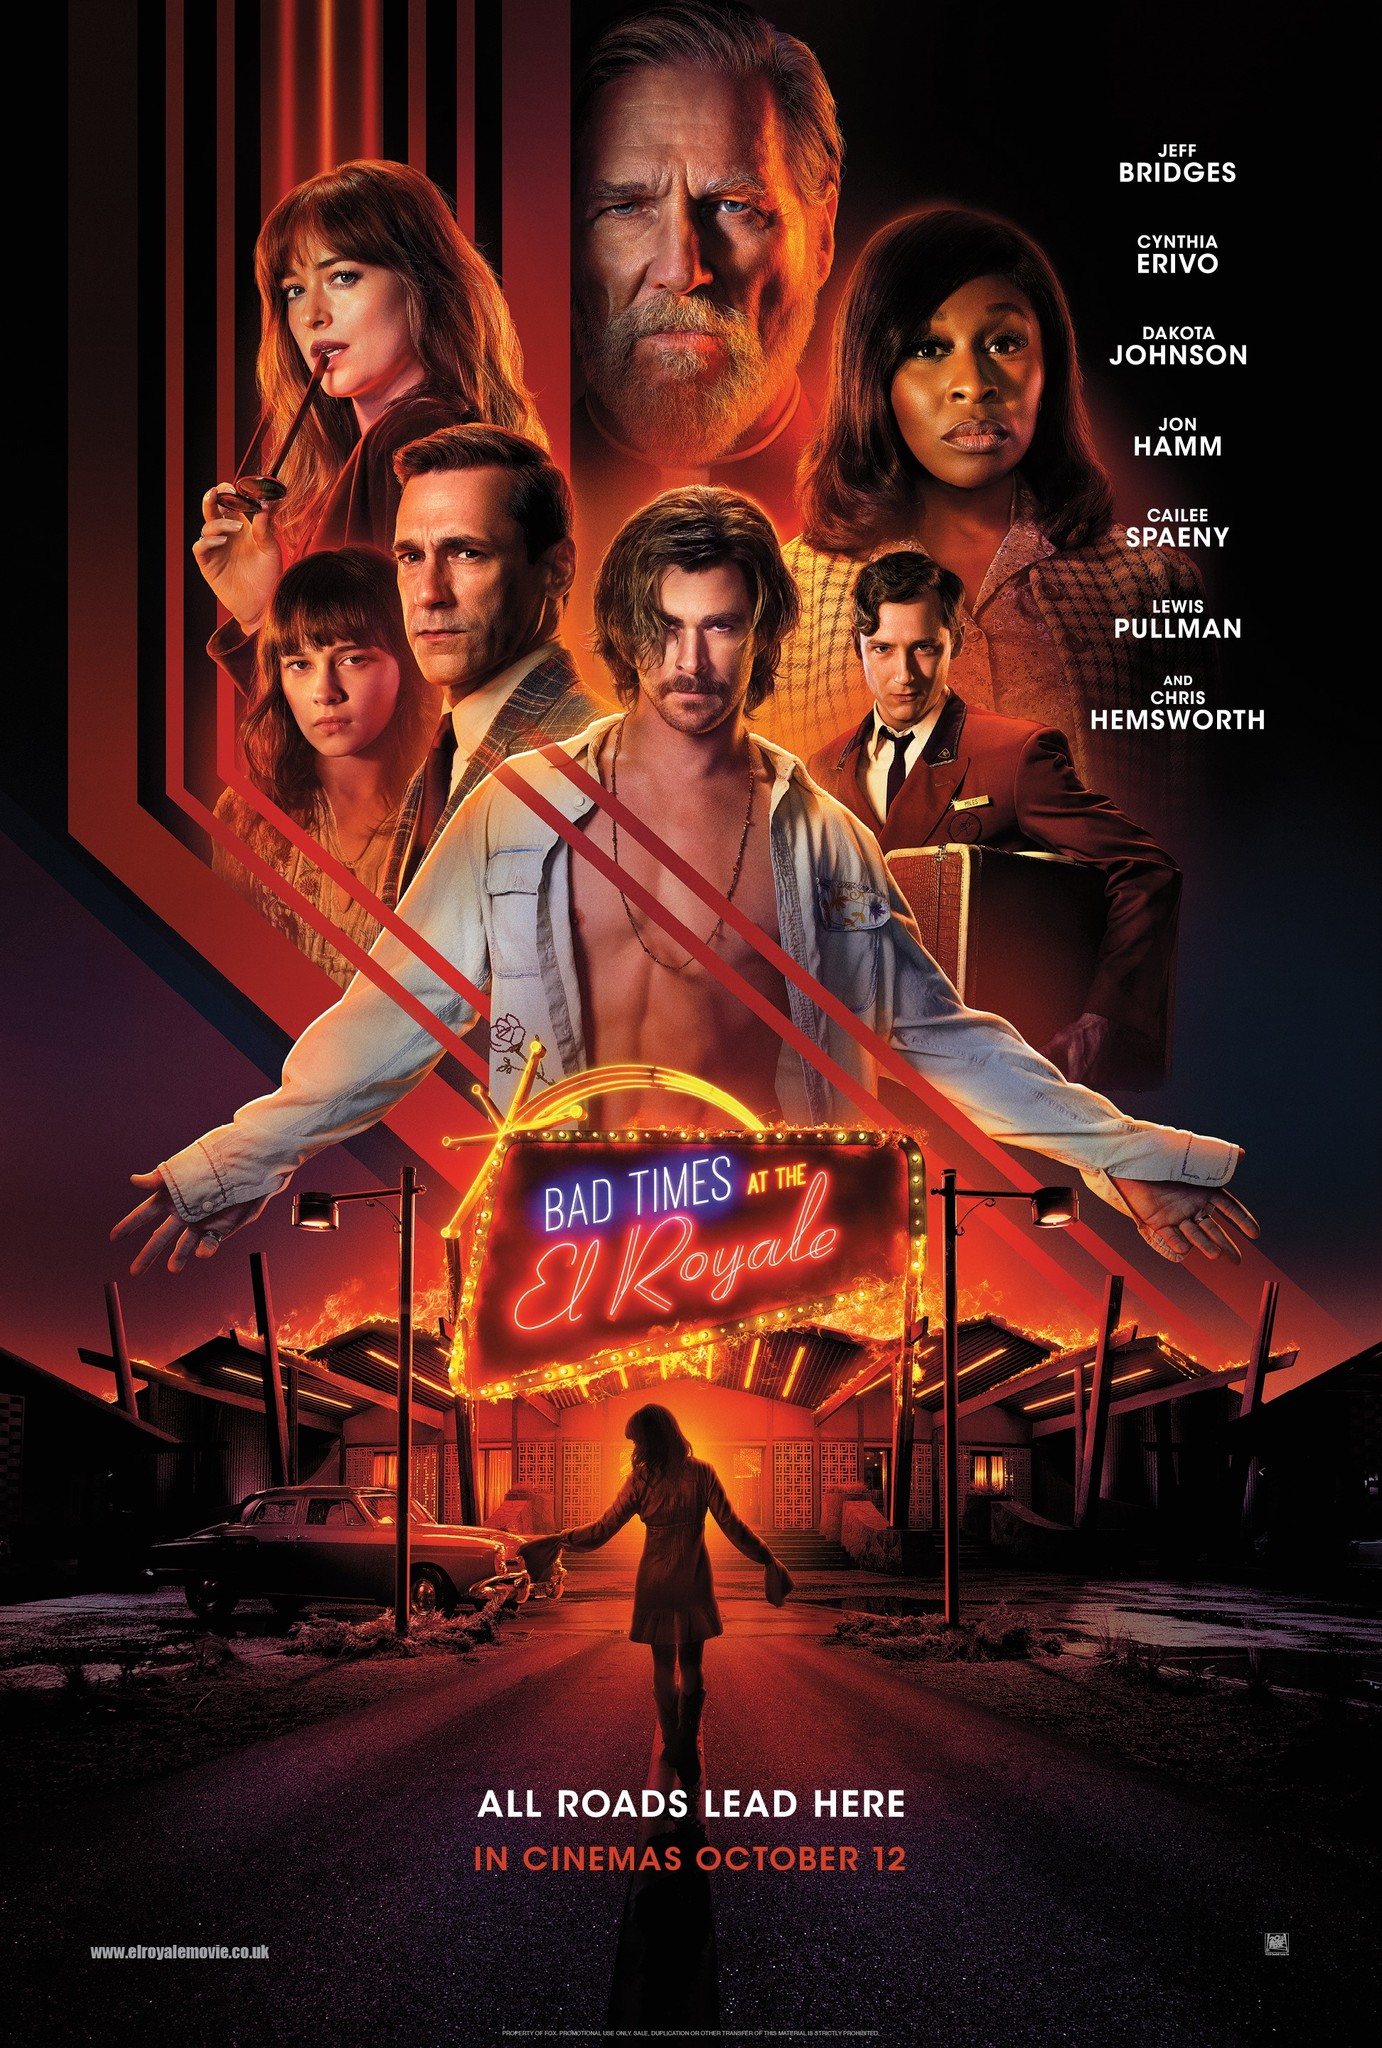 Bad Times at the El Royale   (2018) dir. Drew Goddard Rated: R image: ©2018  20th Century Fox